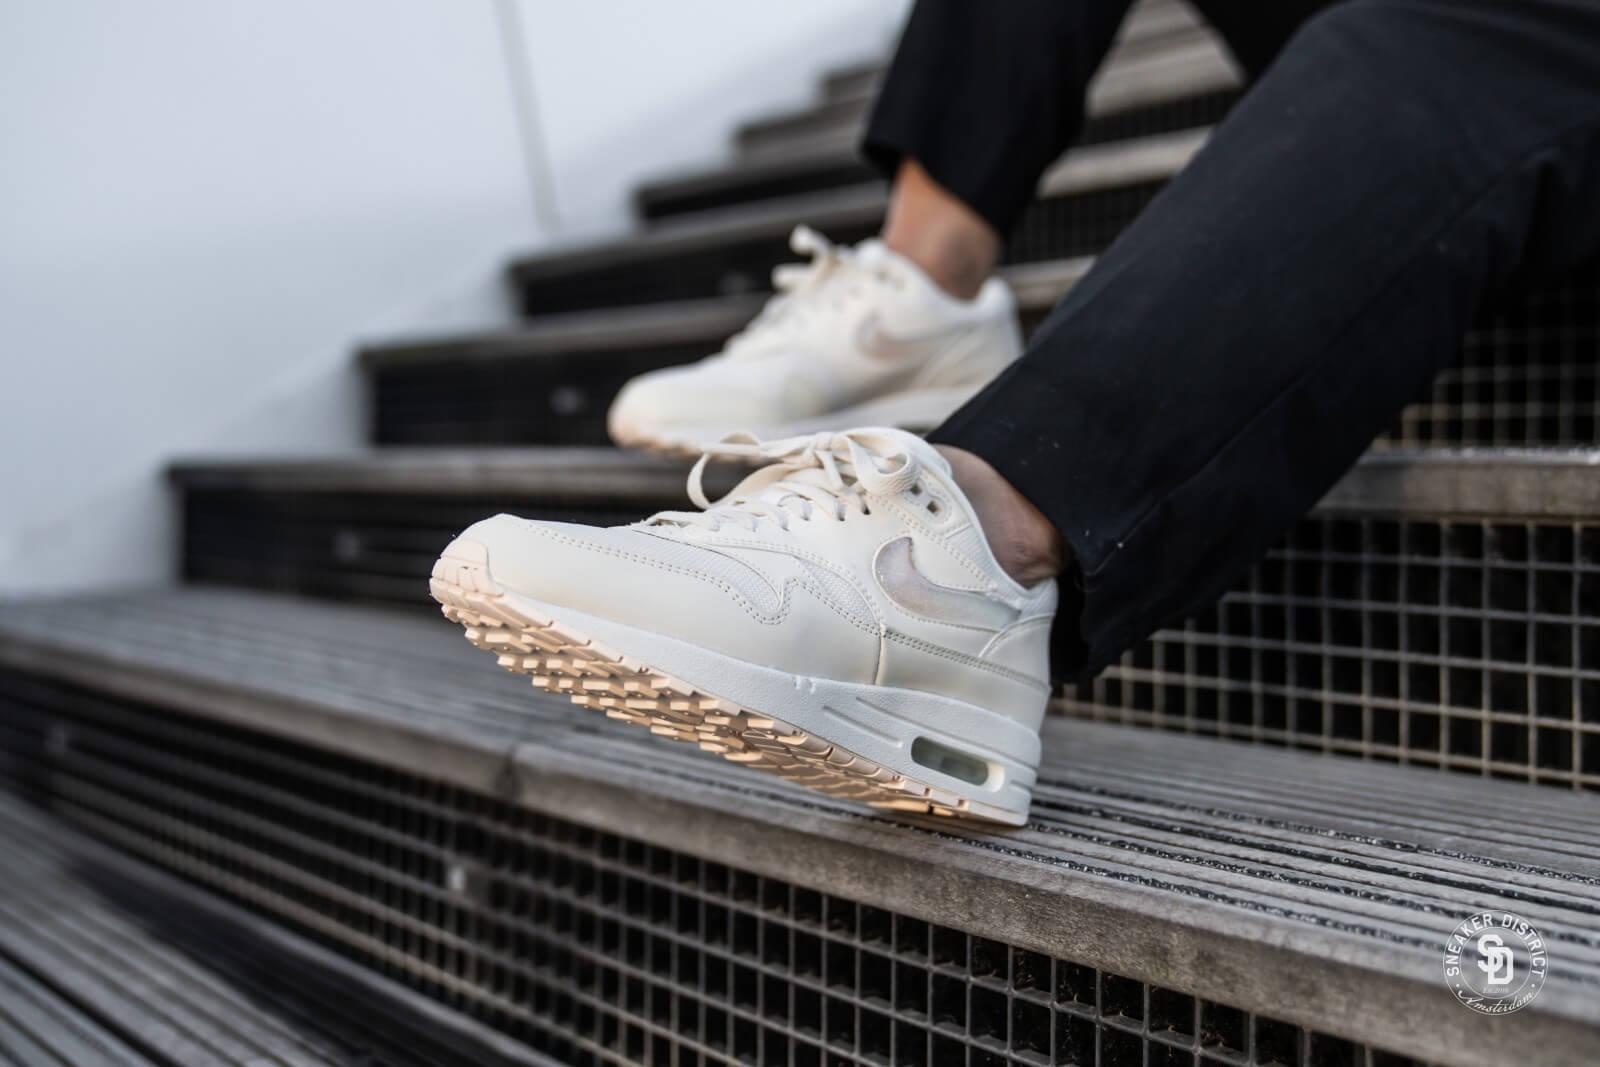 Shoes NIKE Air Max 1 Jp AT5248 100 Pale IvorySummit White